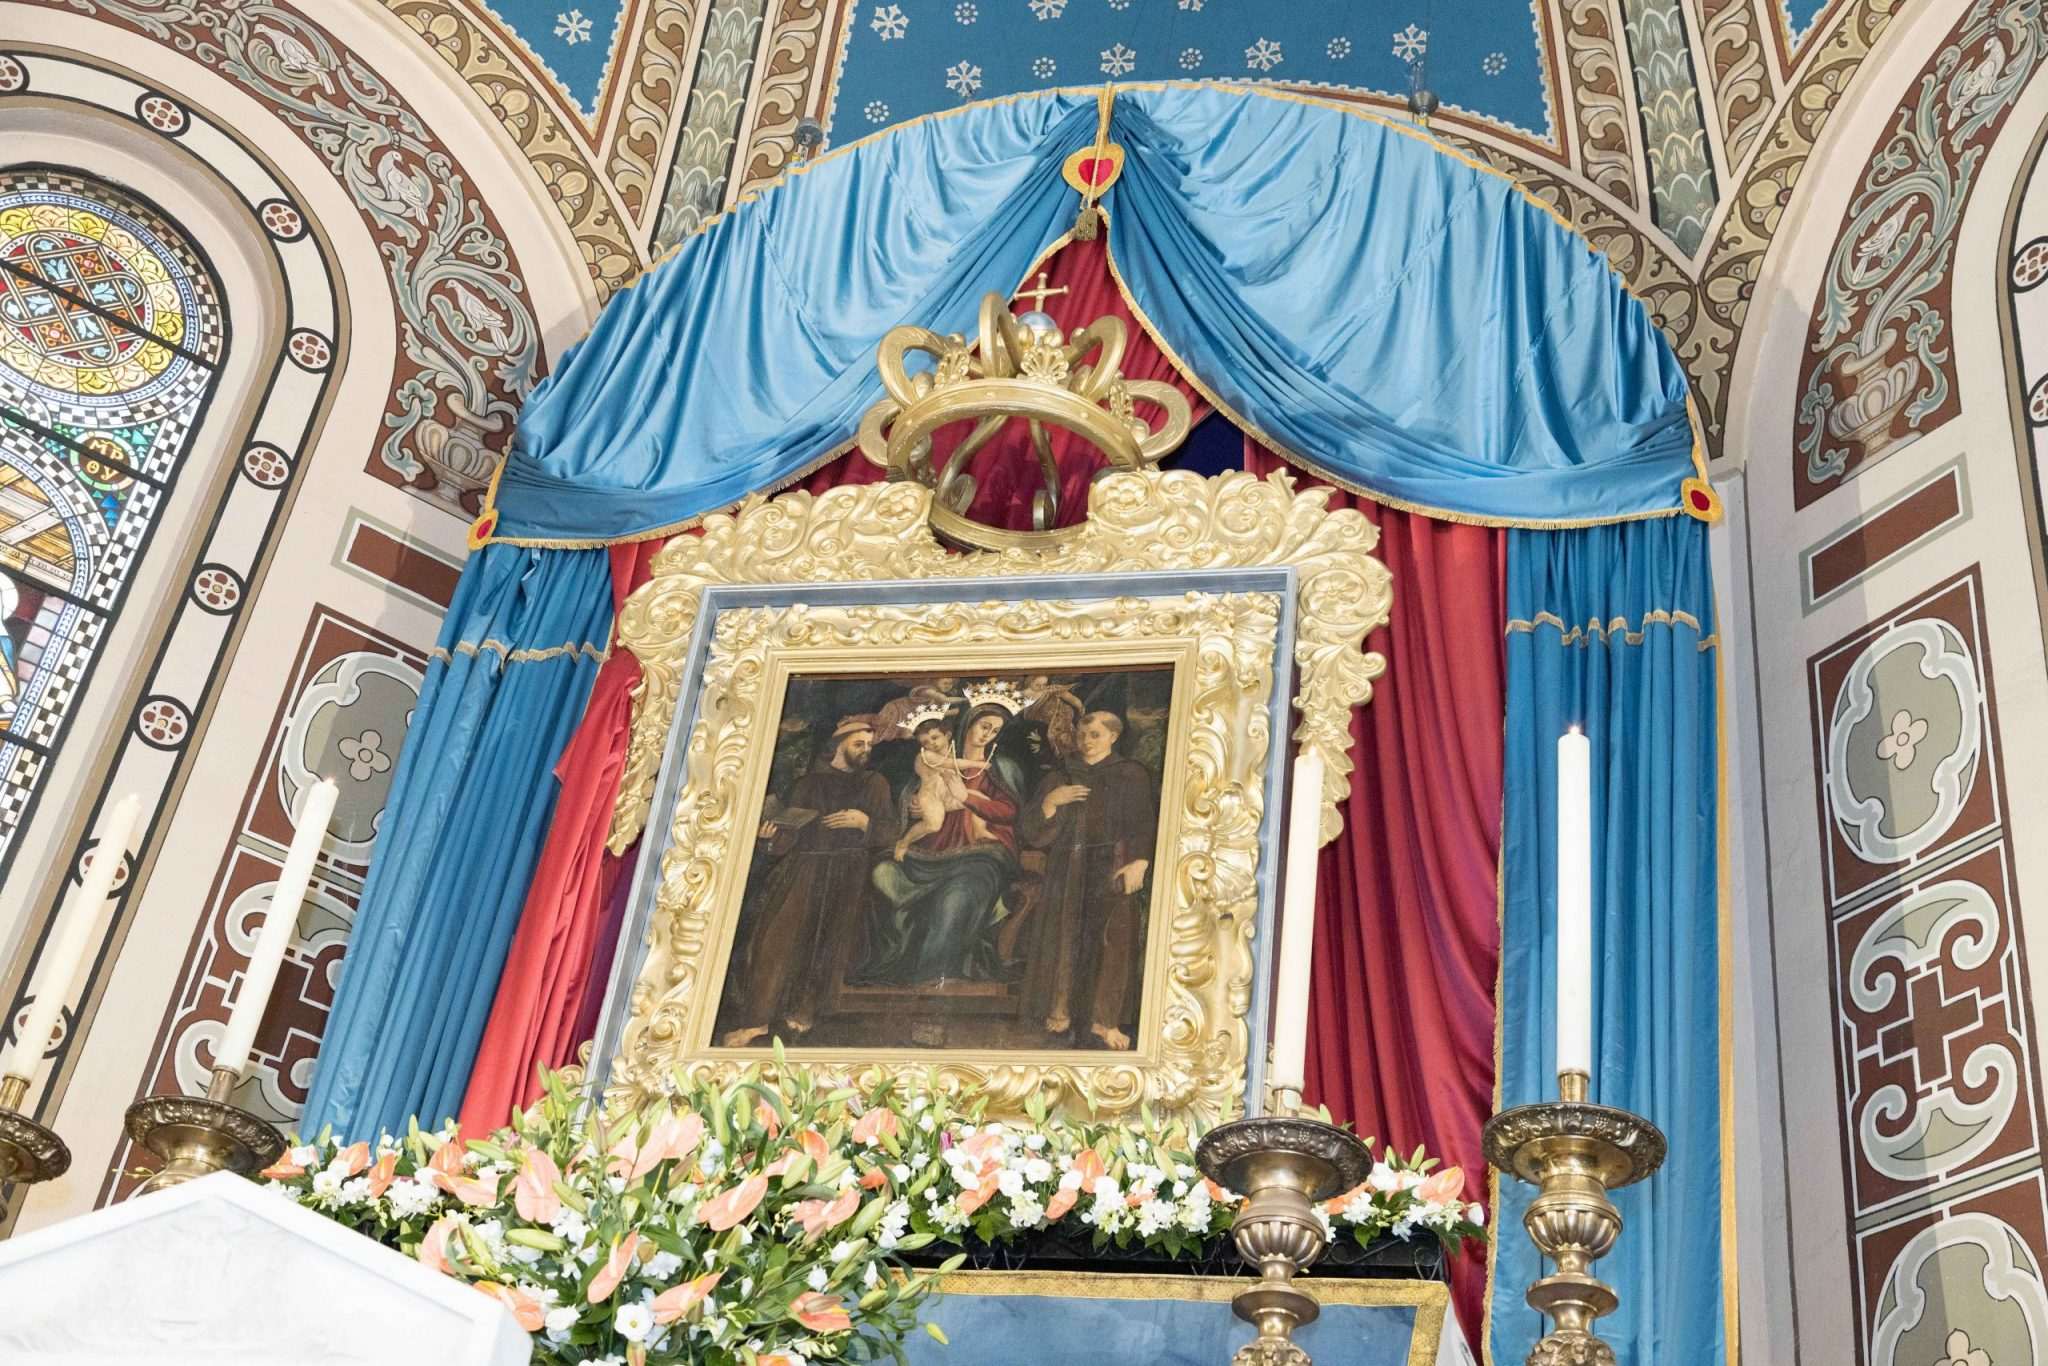 Novità per i pelligrinaggi mariani